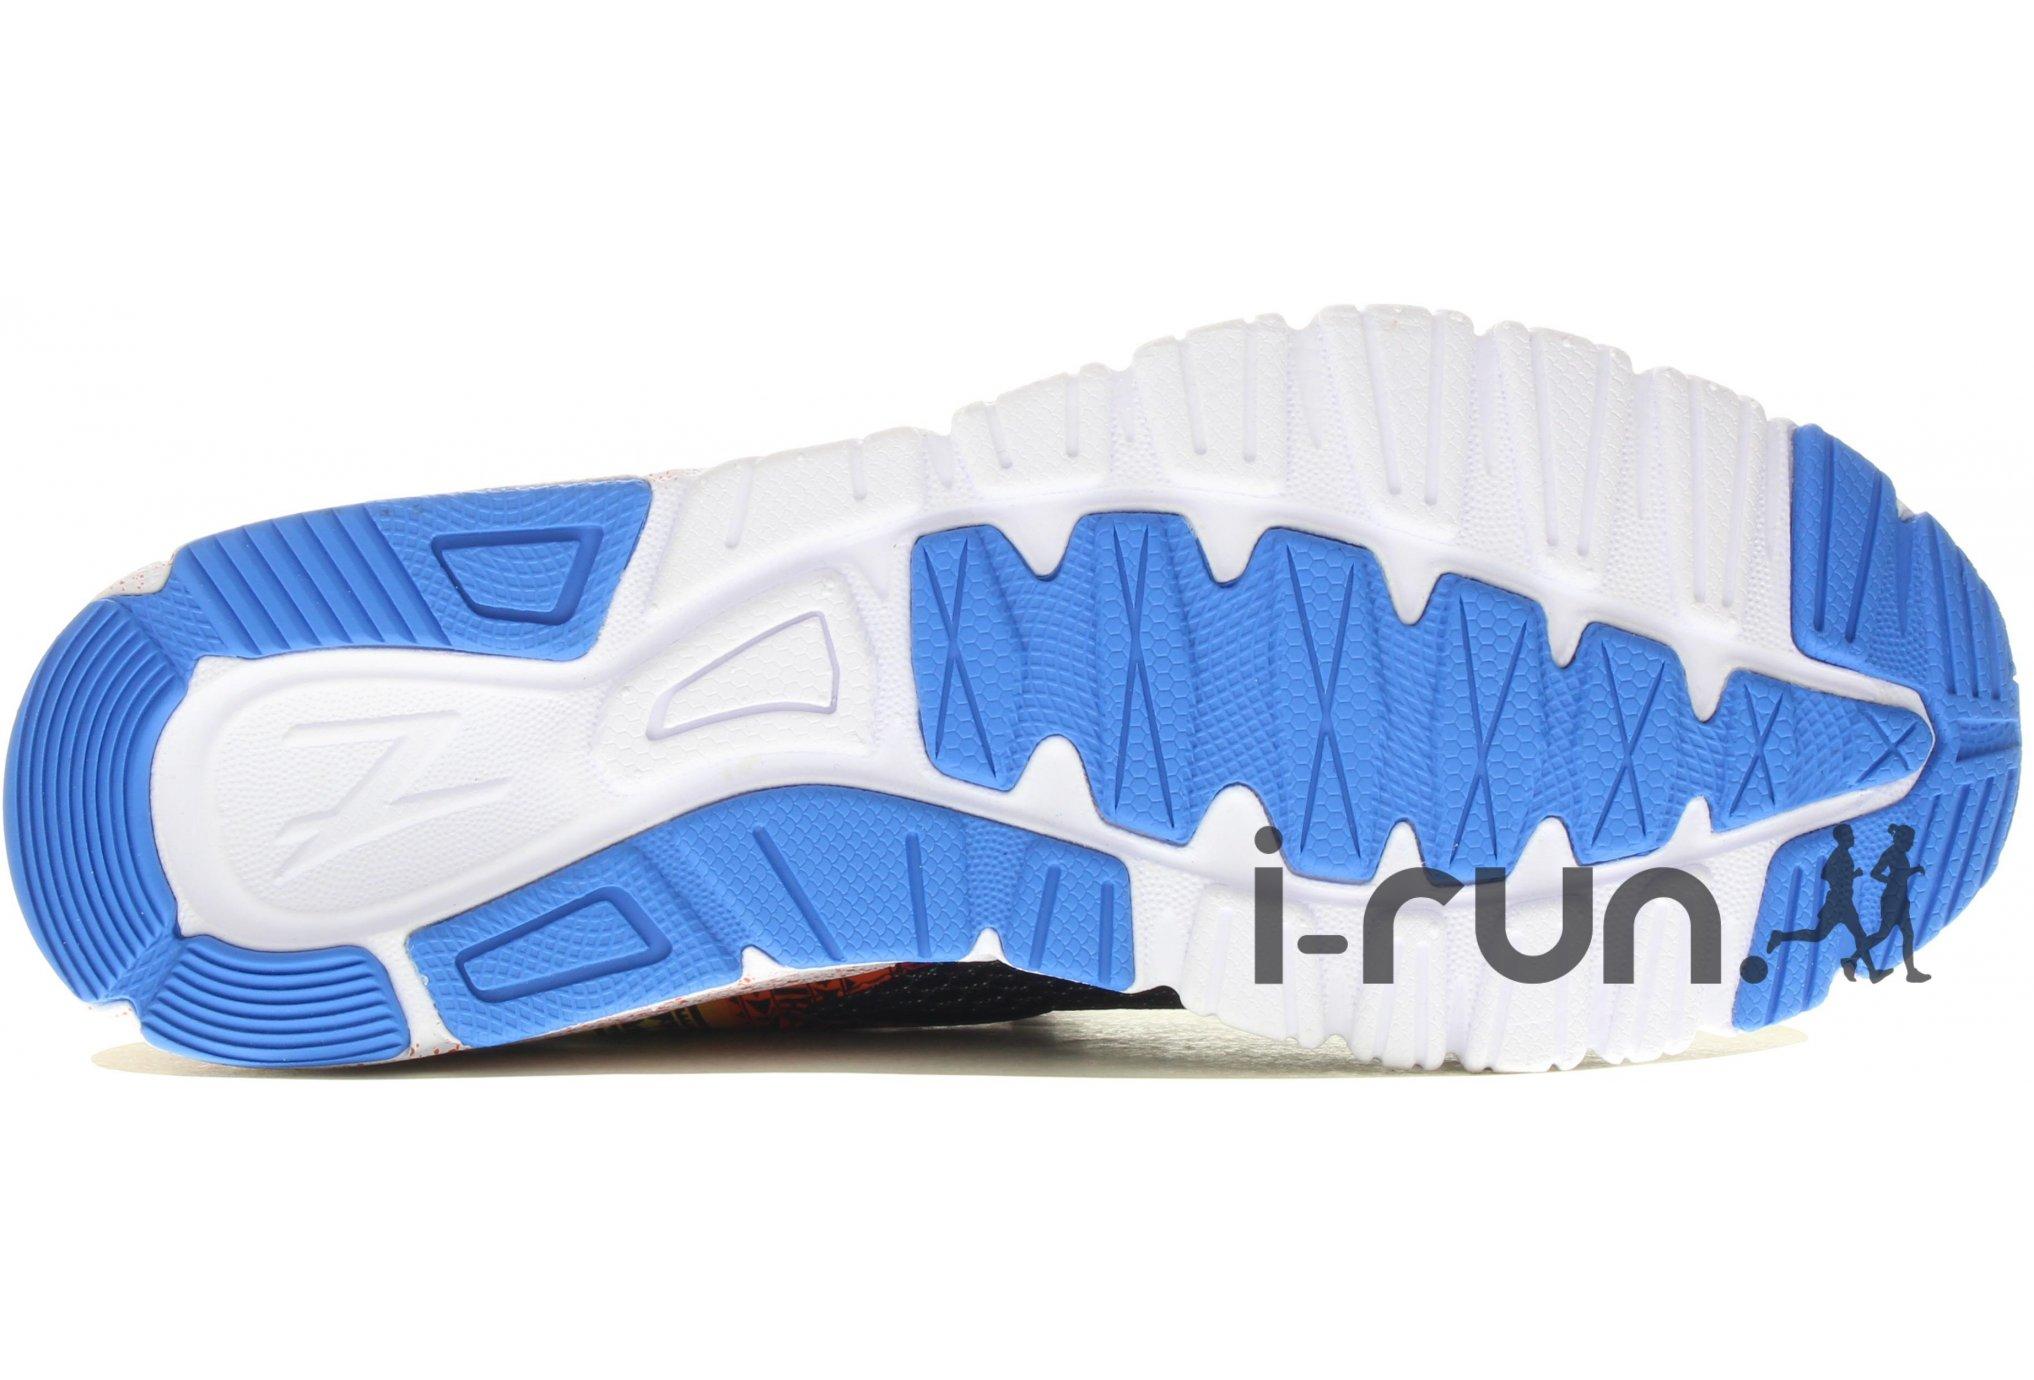 Hawaiian Running Chaussure – De Flying Run Zoot U Ali'i Test dSZ16qxwYY